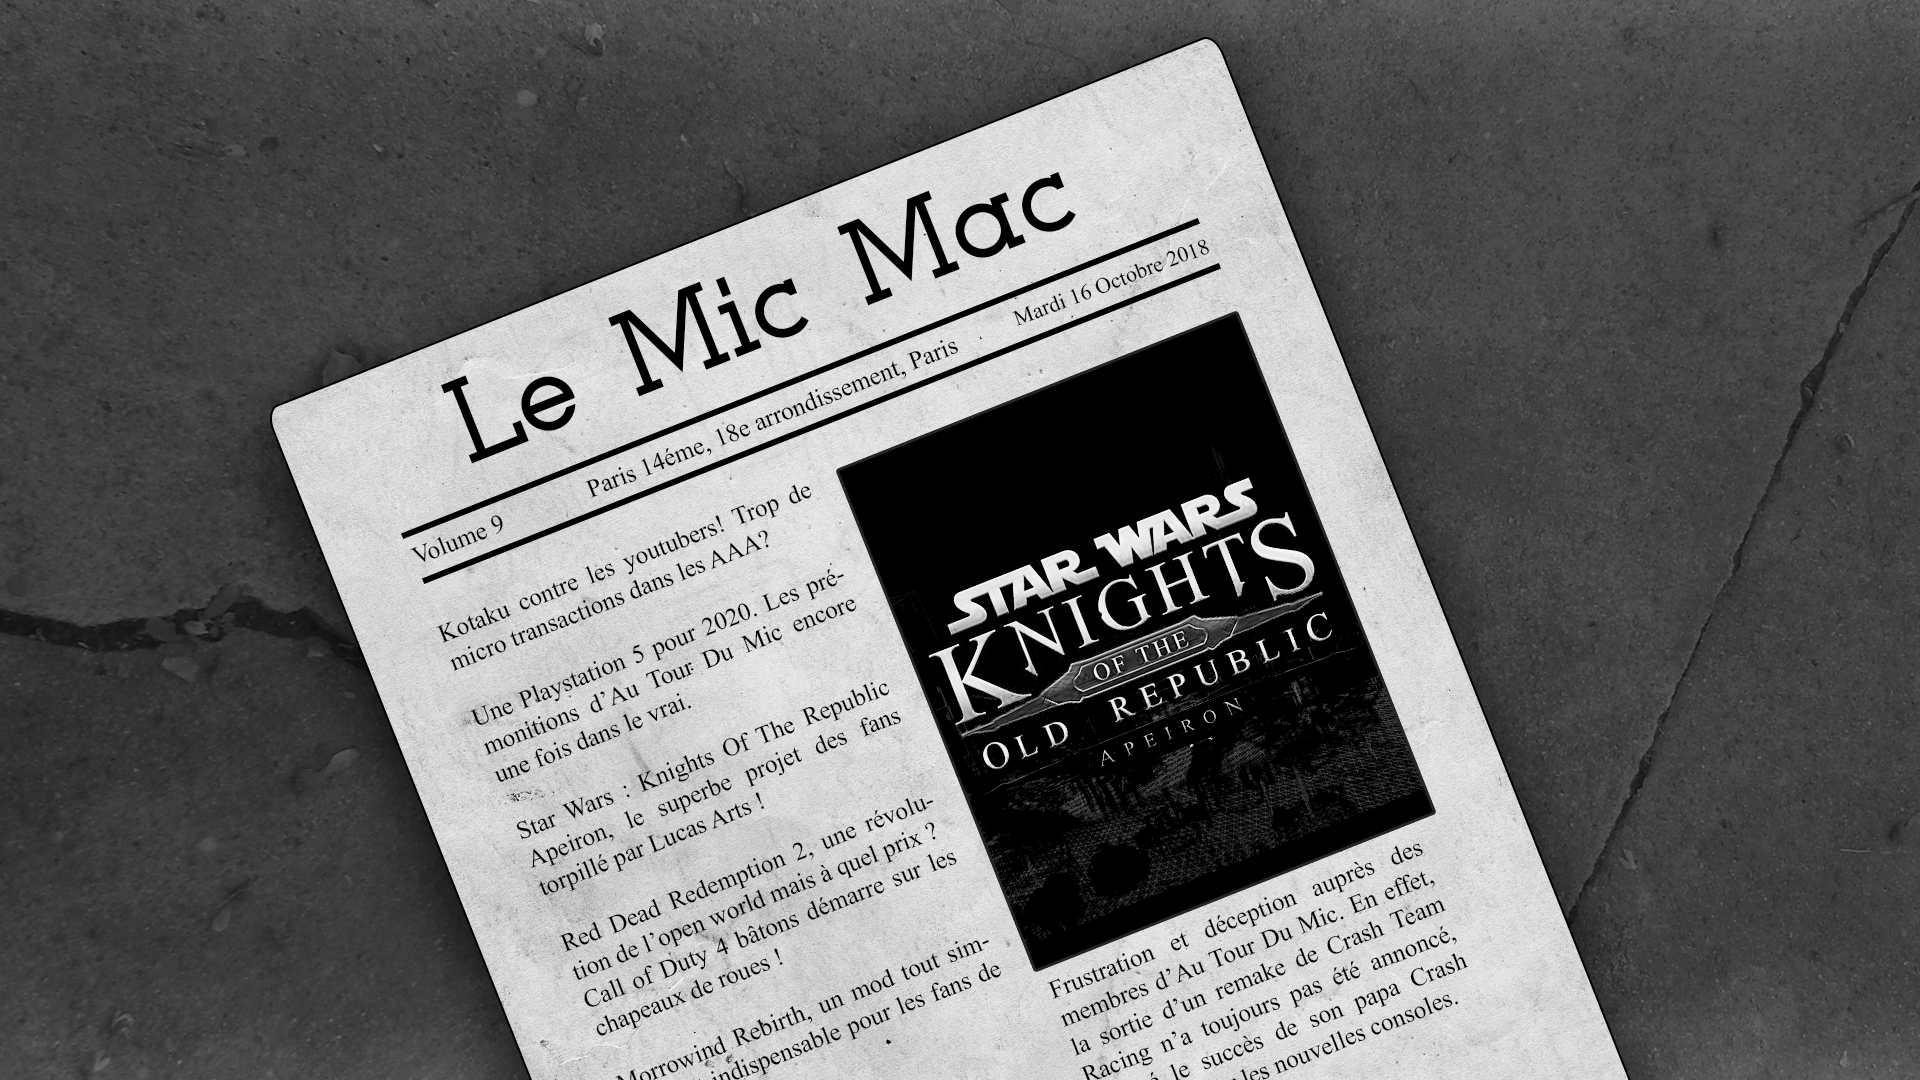 Au Tour du Mic – Mic Mac #9 : 09/10/2018 au 15/10/2018